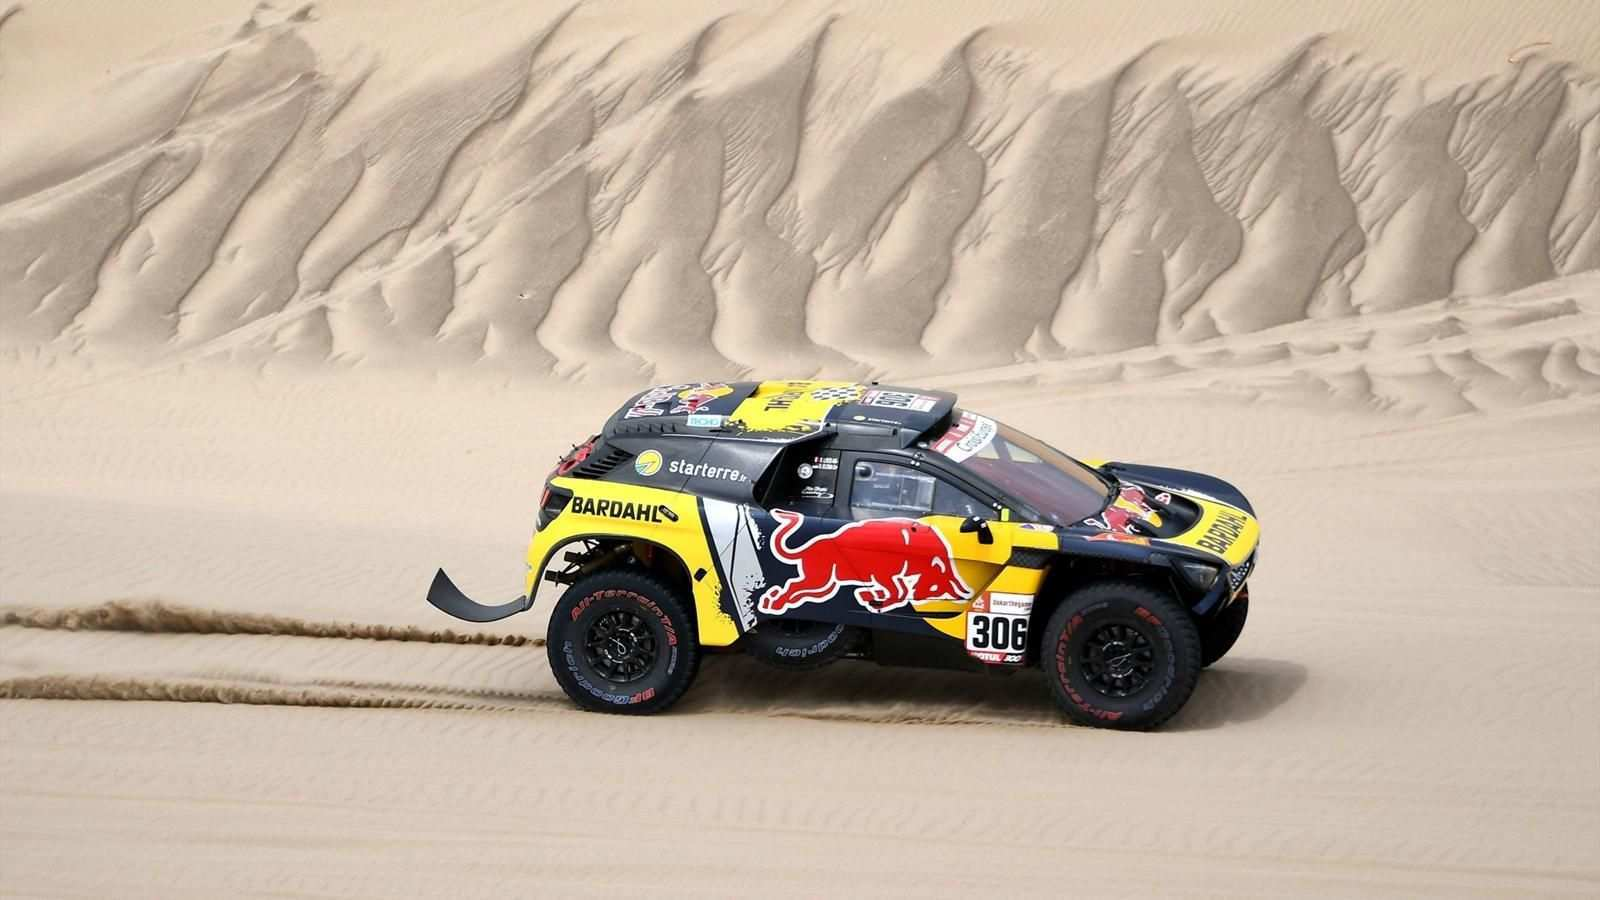 57 Concept of Peugeot Dakar 2019 New Concept by Peugeot Dakar 2019